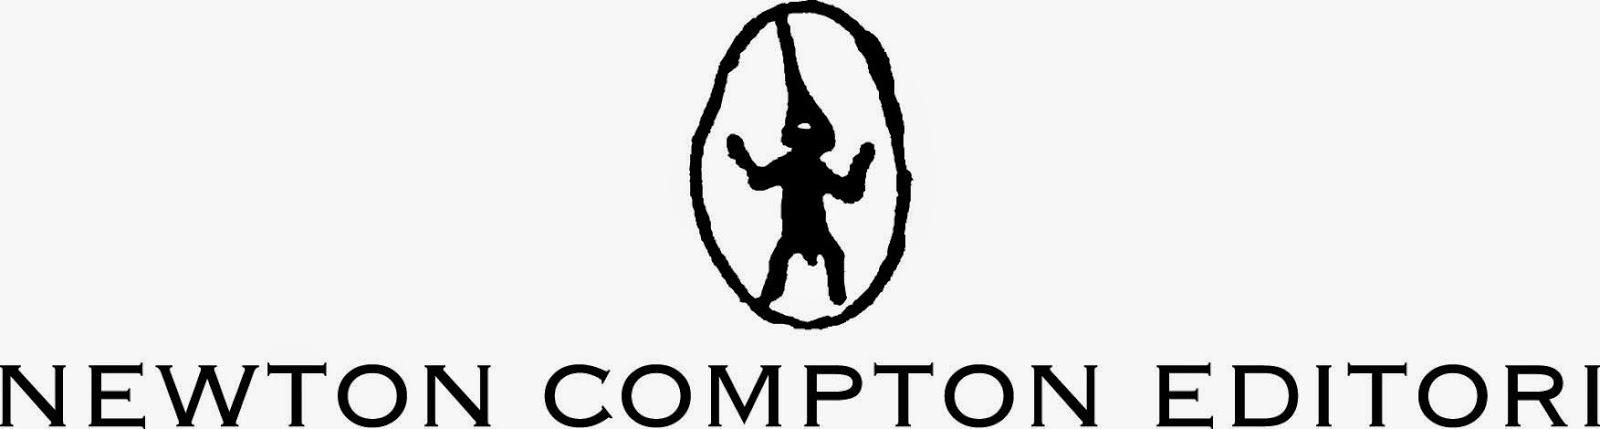 http://www.newtoncompton.com/